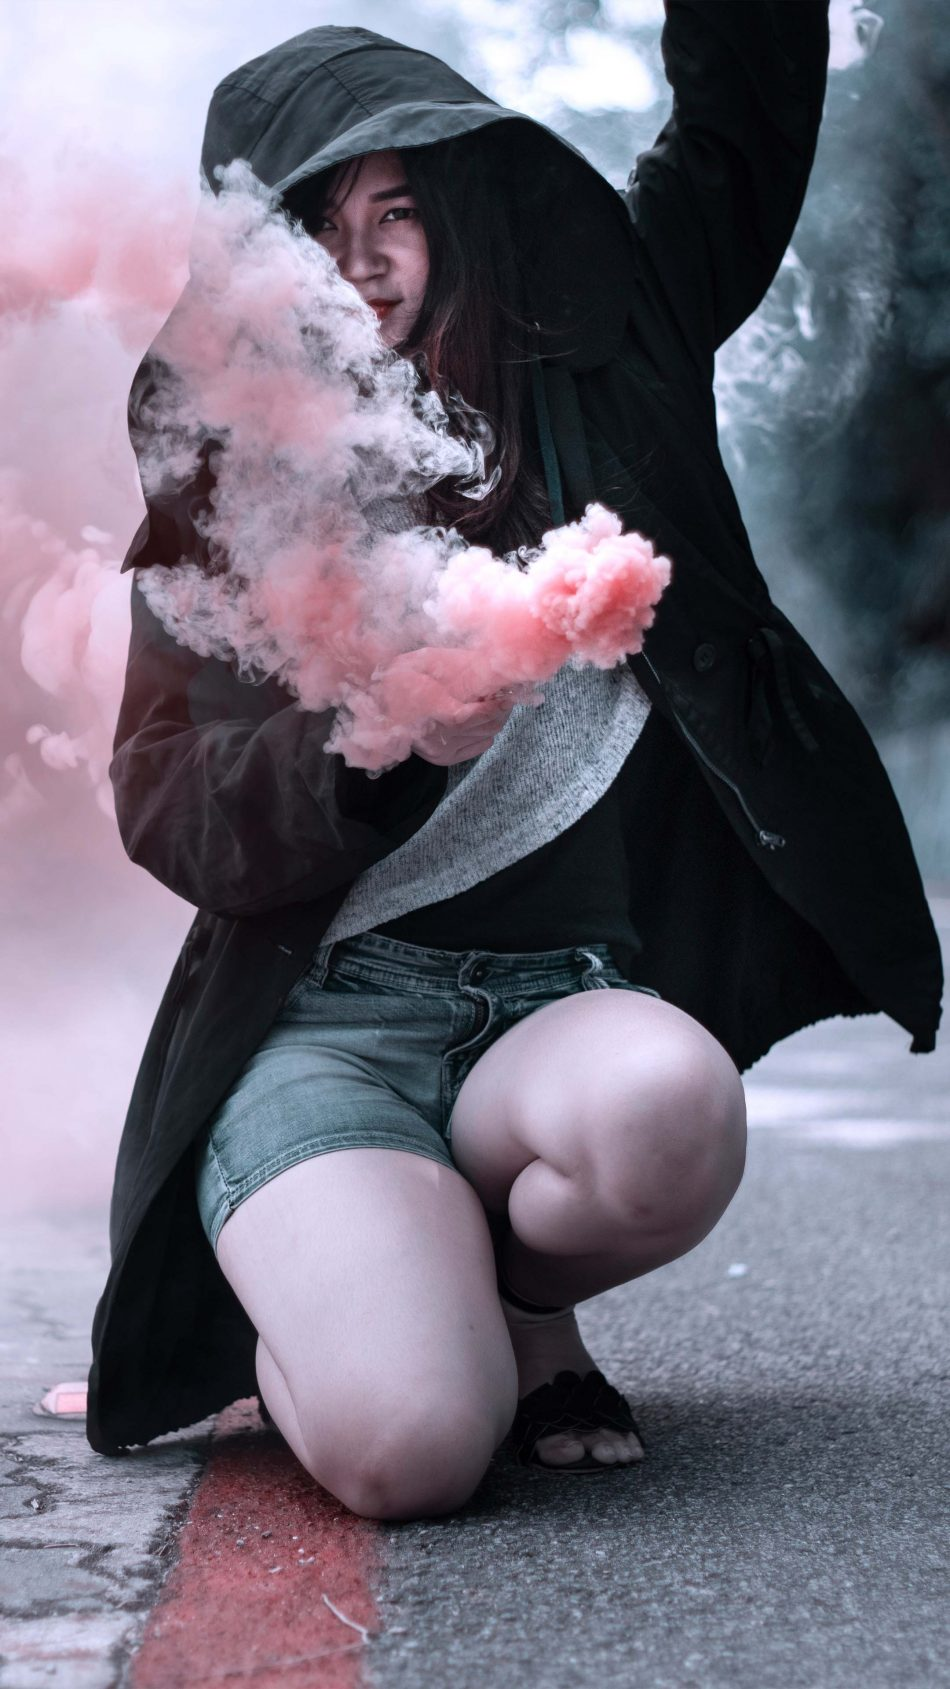 Girl Hoodie Colorful Smoke Bombs Street Portrait 4K Ultra HD Mobile Wallpaper